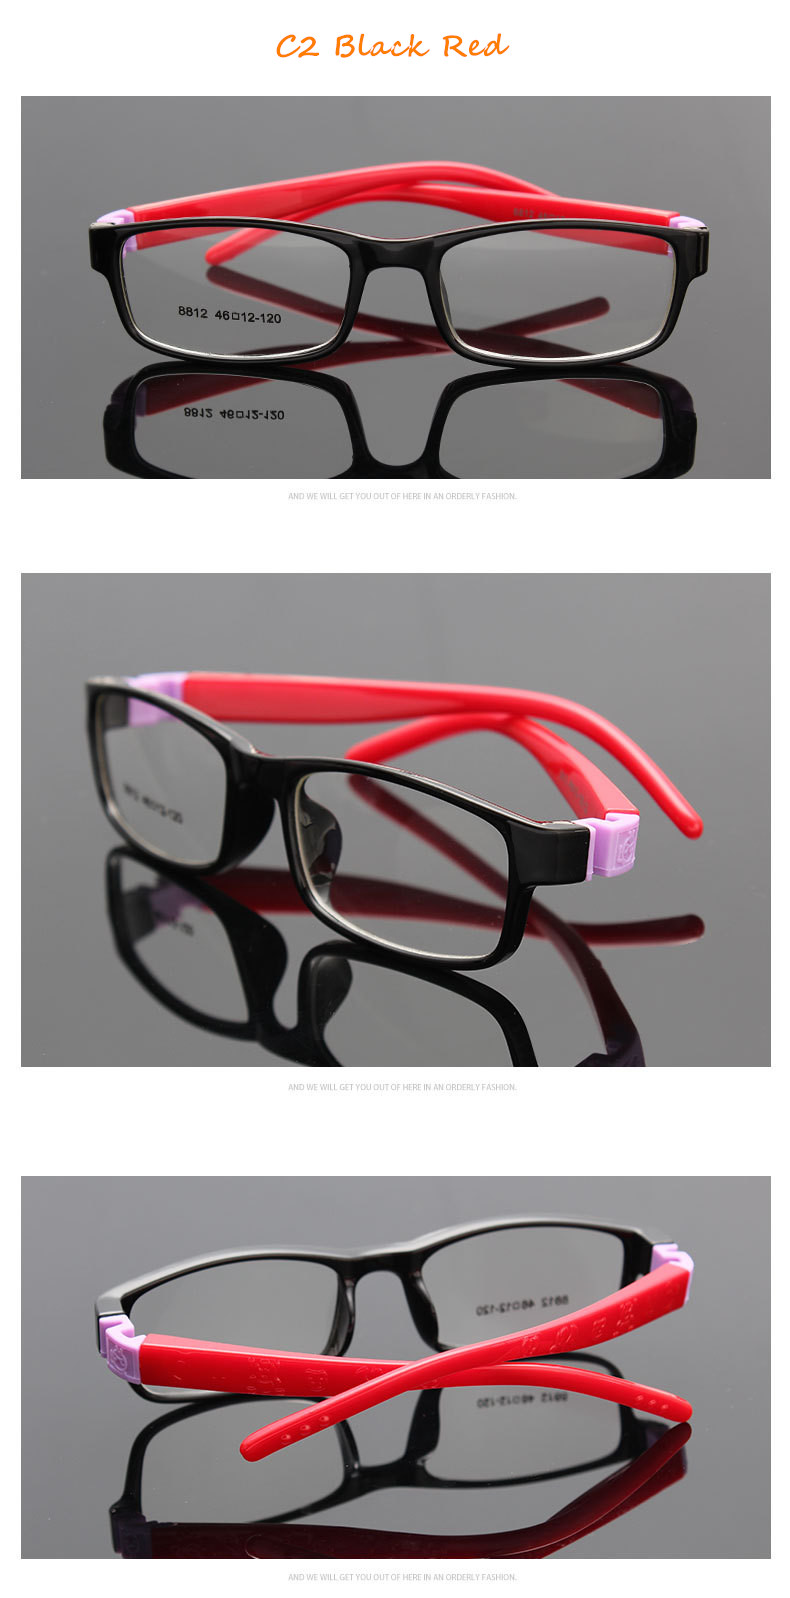 Orderly Fashion Baby Boys Girls Childrens Kids Uv Protection Goggles Eyewear Sunglasses Boy's Glasses